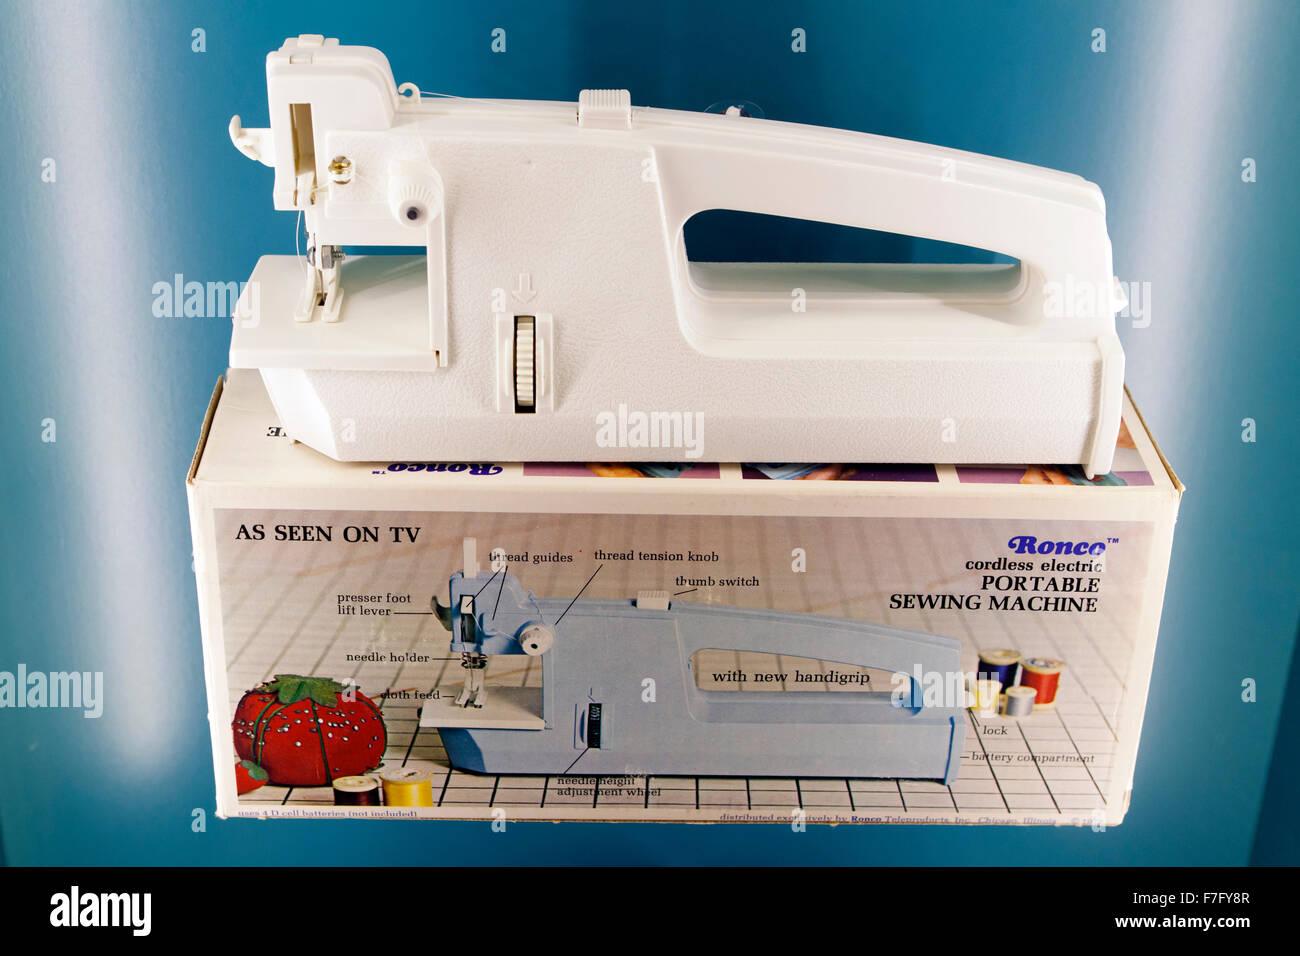 Ronco cordless electric portable sewing machine, circa 1970s - Stock Image